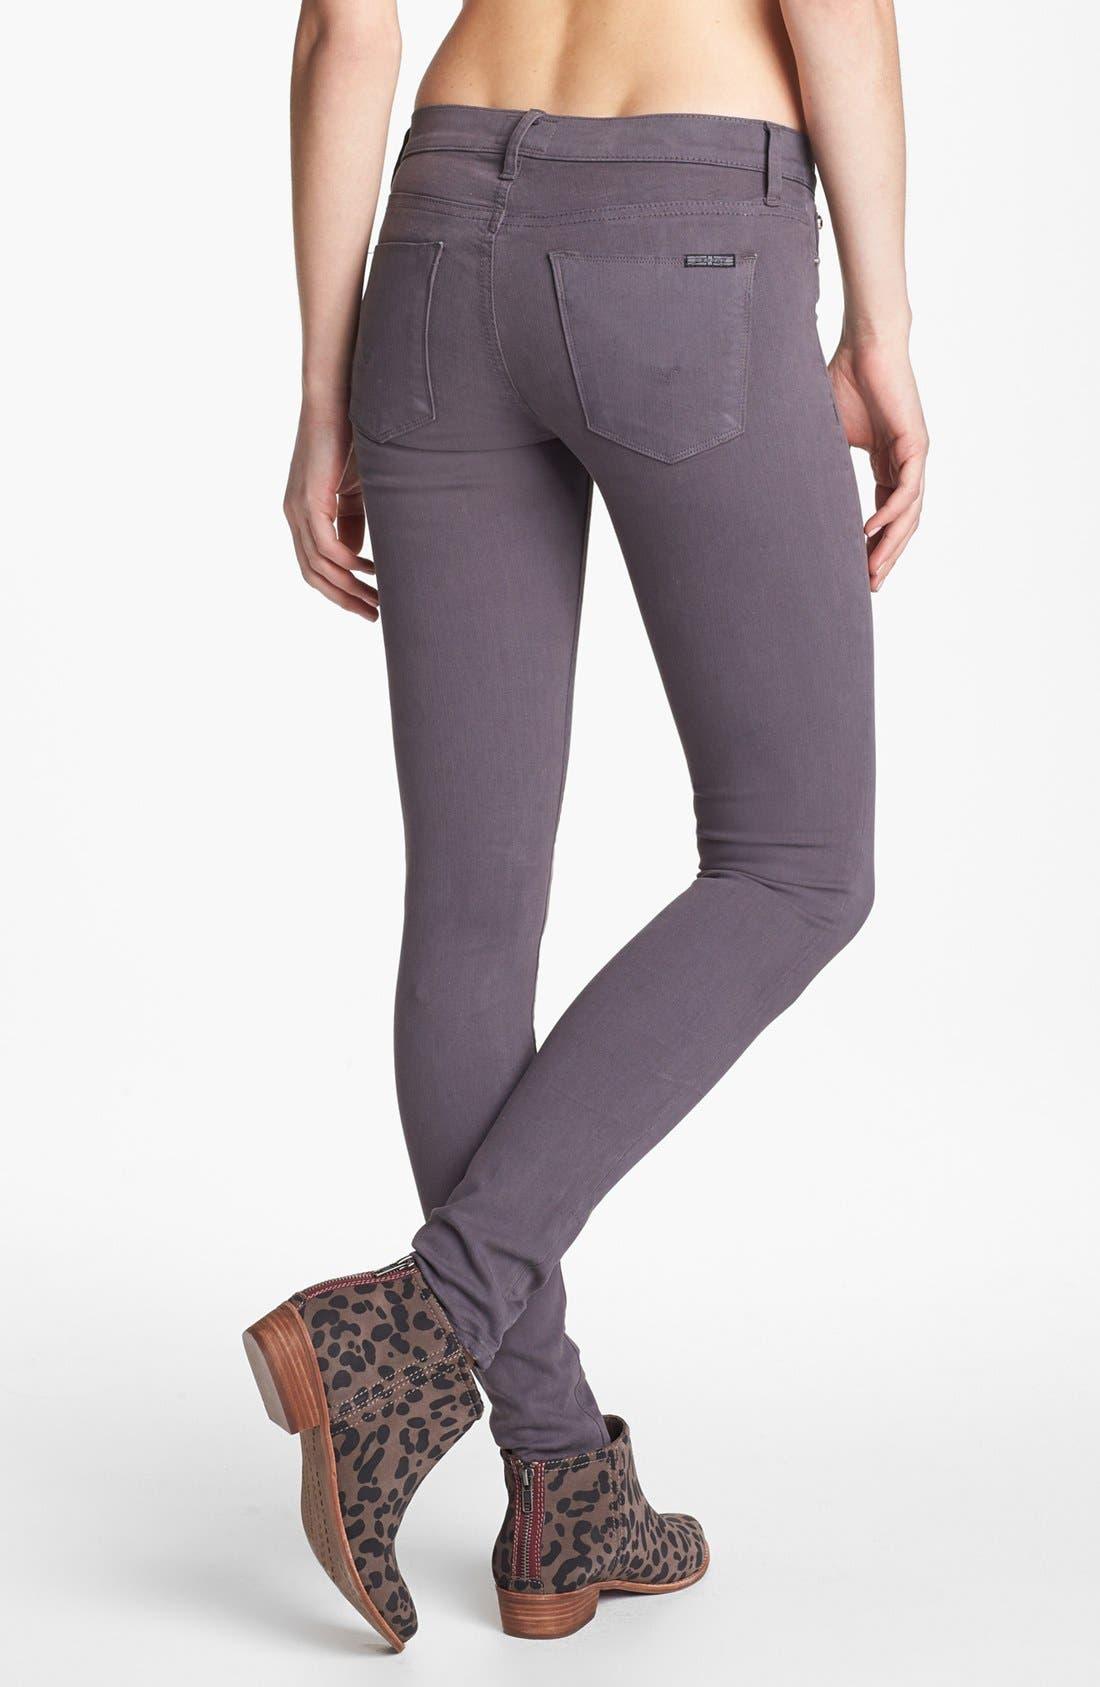 Alternate Image 2  - Hudson Jeans 'Colette' Mid Rise Skinny Jeans (Steel Grey)